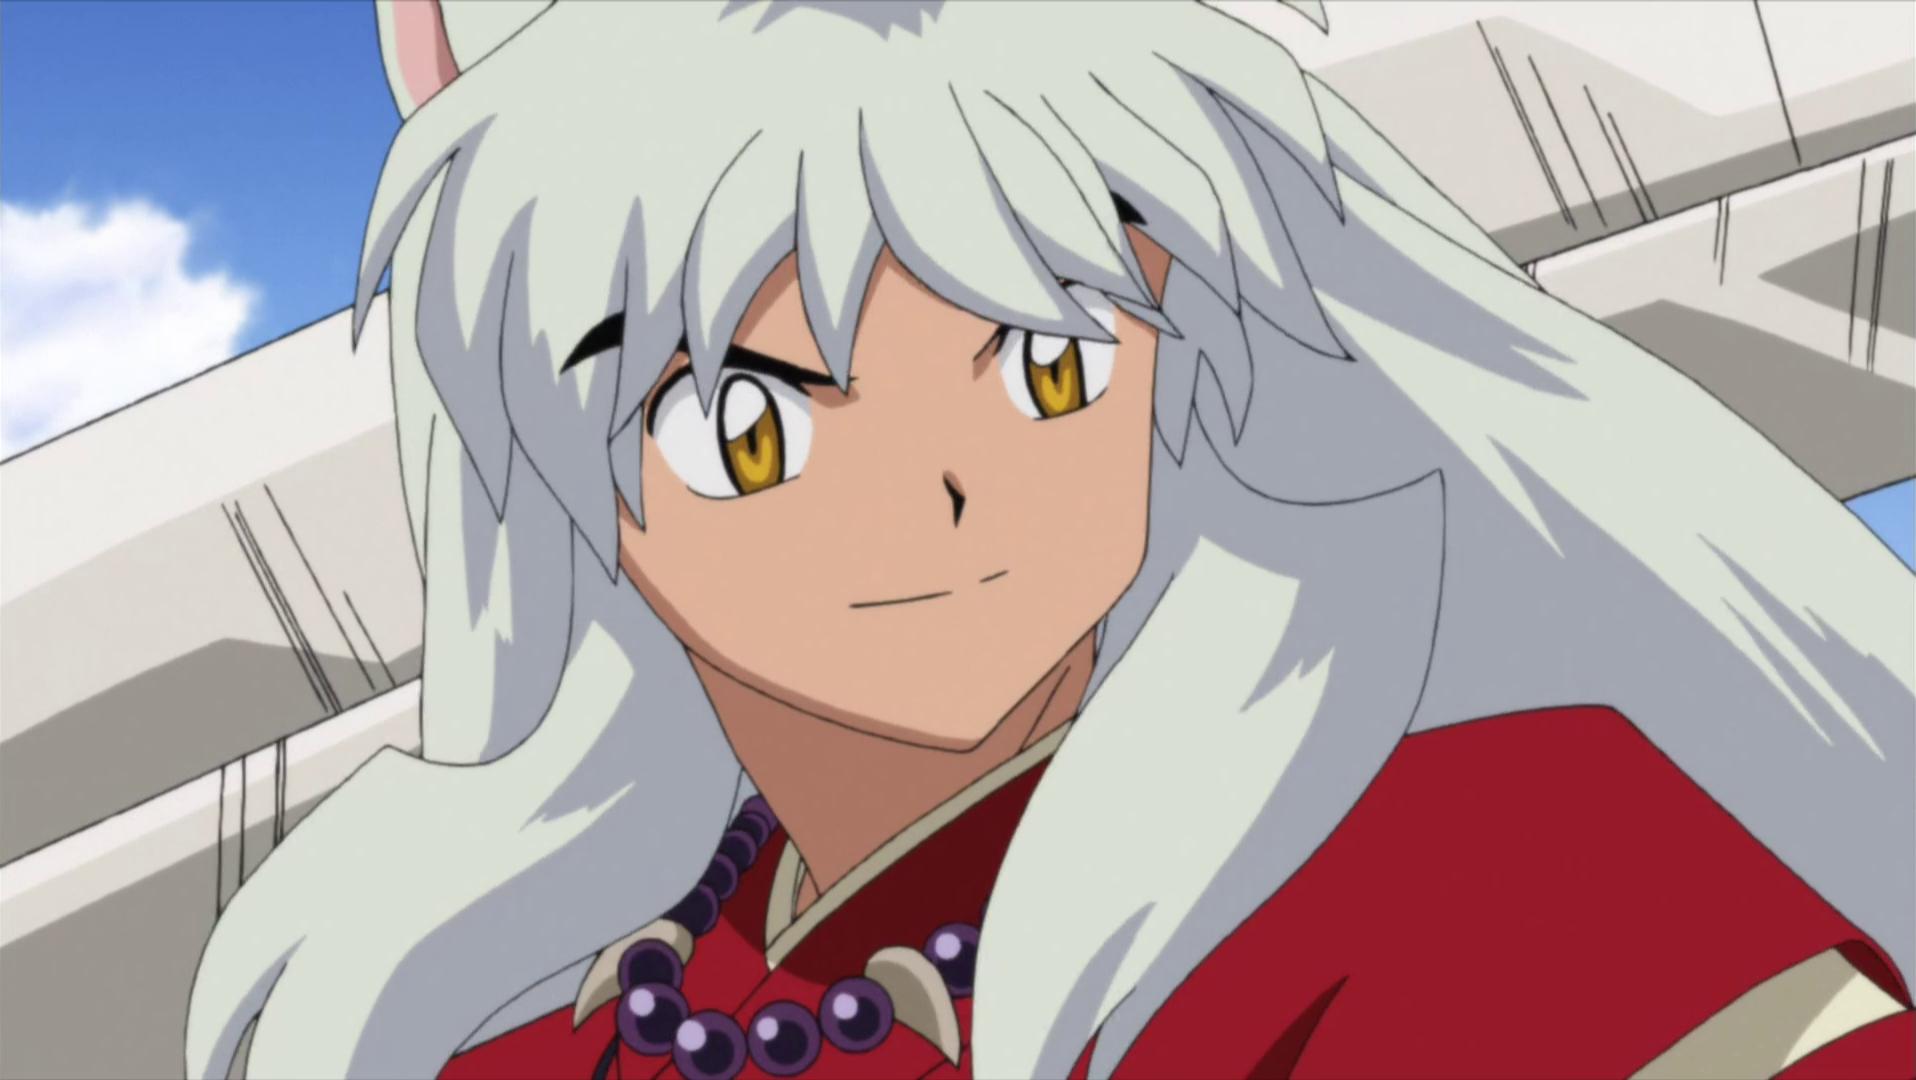 Hanyō | InuYasha | FANDOM powered by Wikia